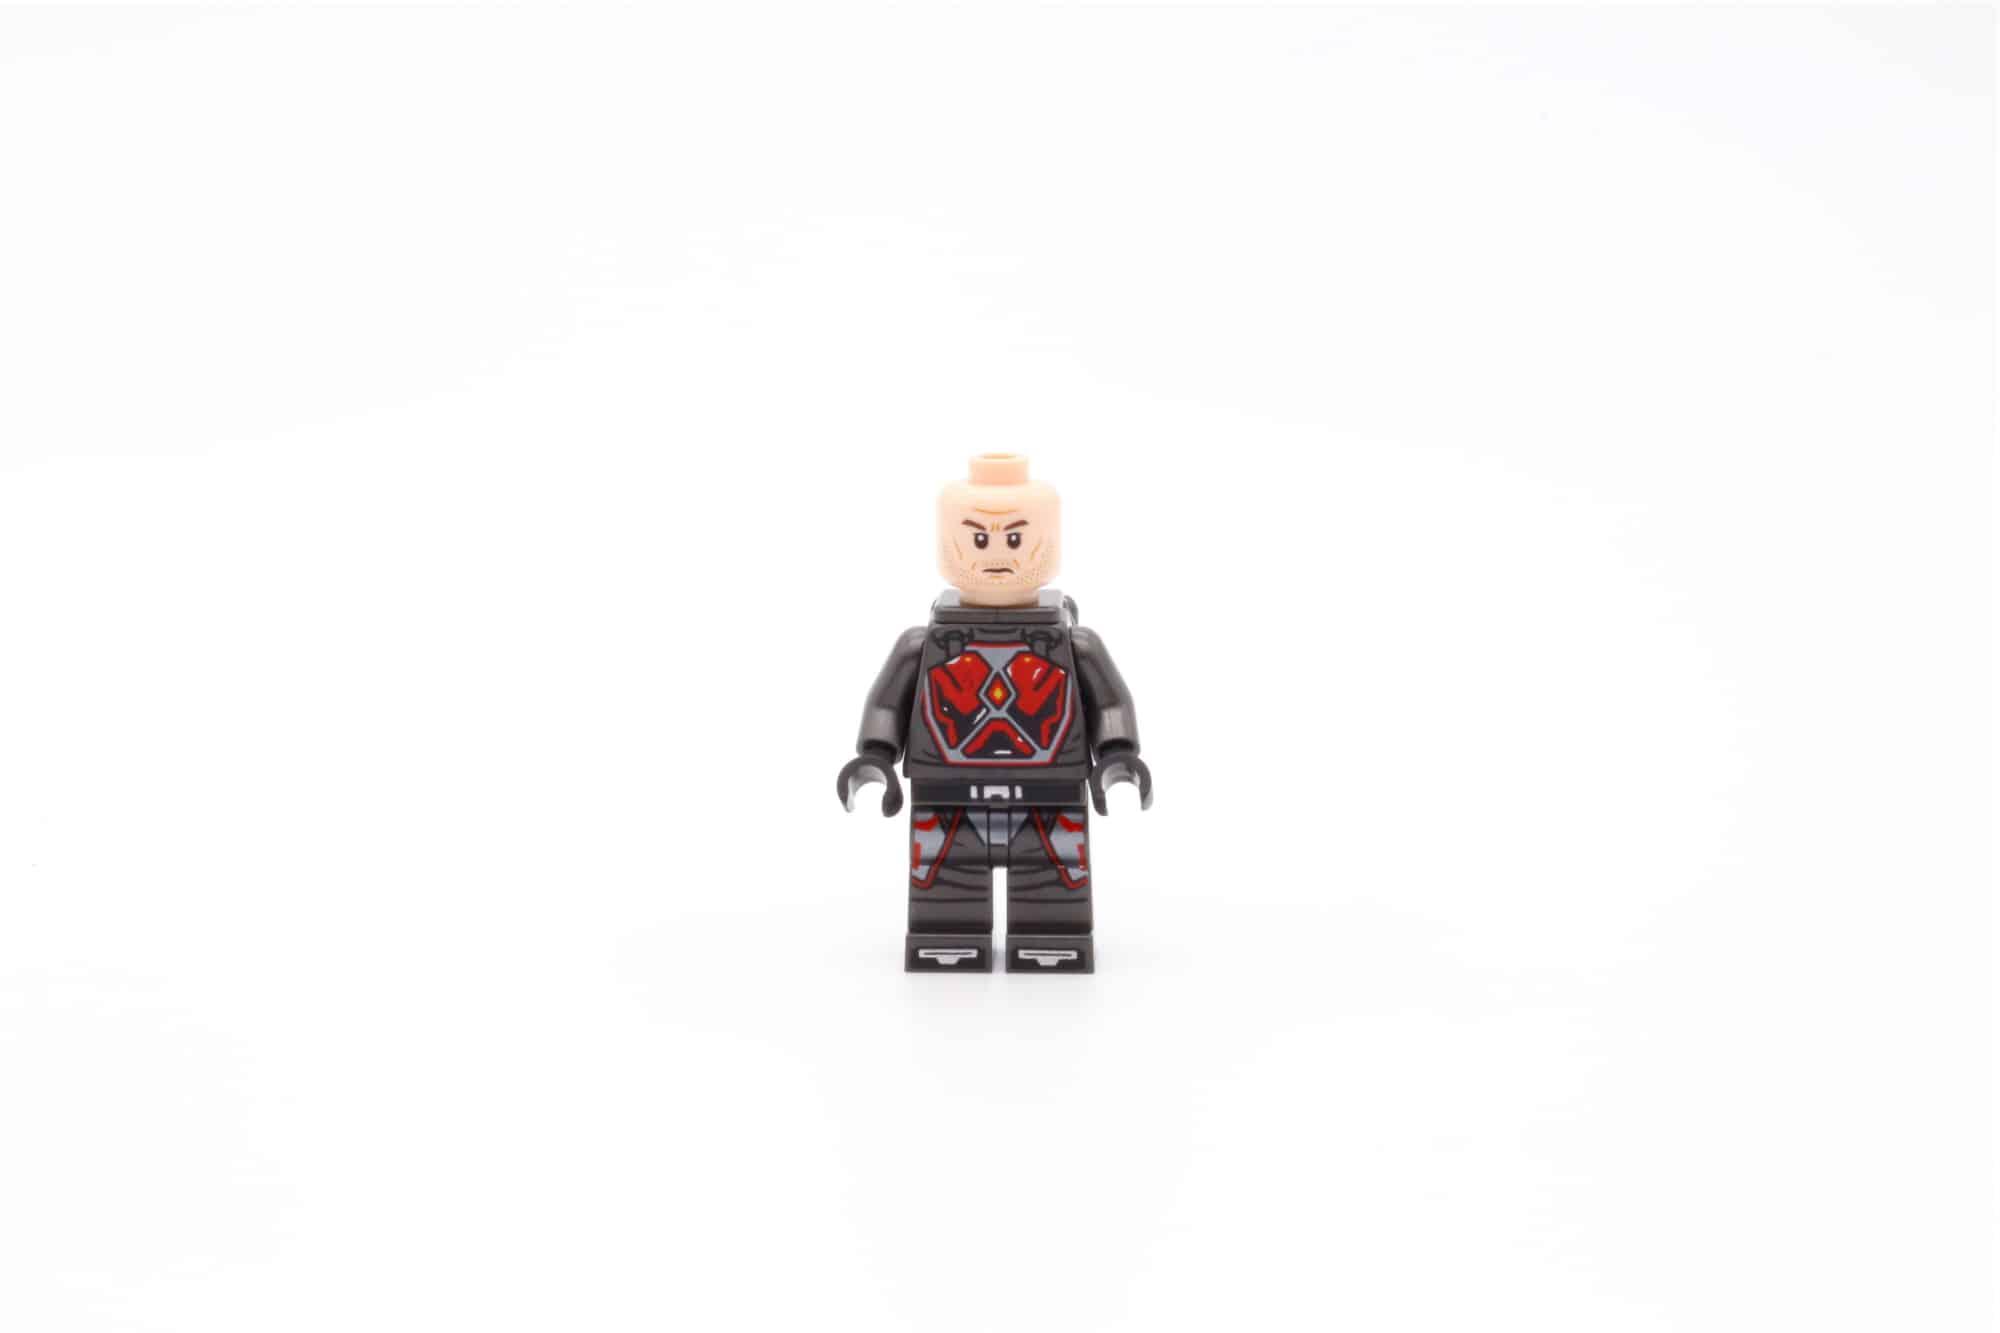 LEGO Star Wars 75316 Mandalorian Starfighter 8